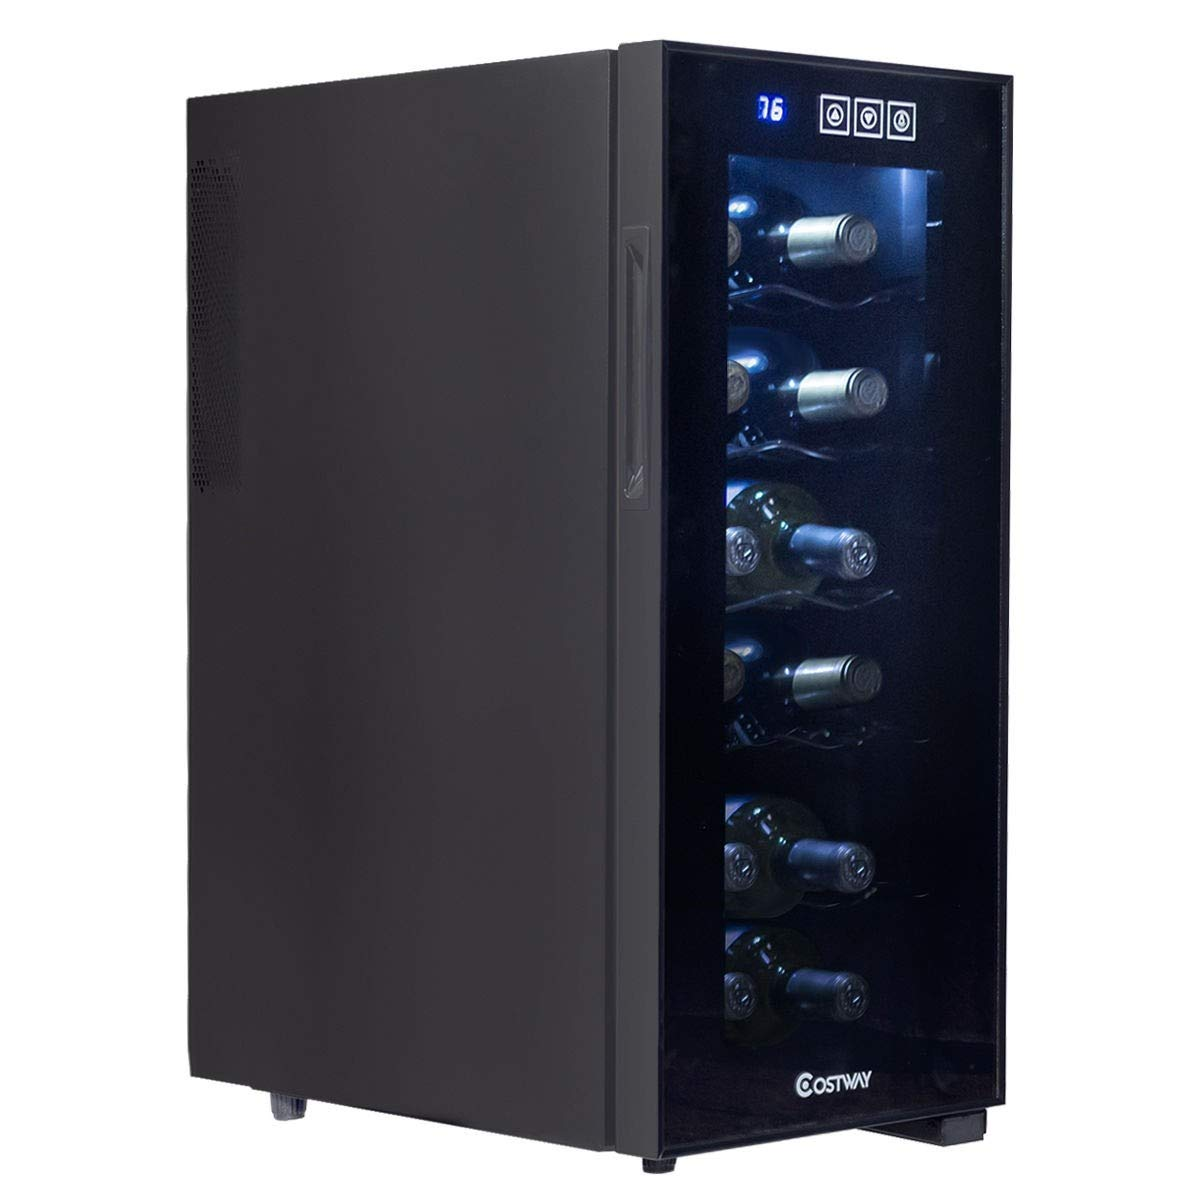 12 Bottle Standing Thermoelectric Wine Cooler New Perfect Beautiful Classic Elegant Useful CHOOSEandBUY